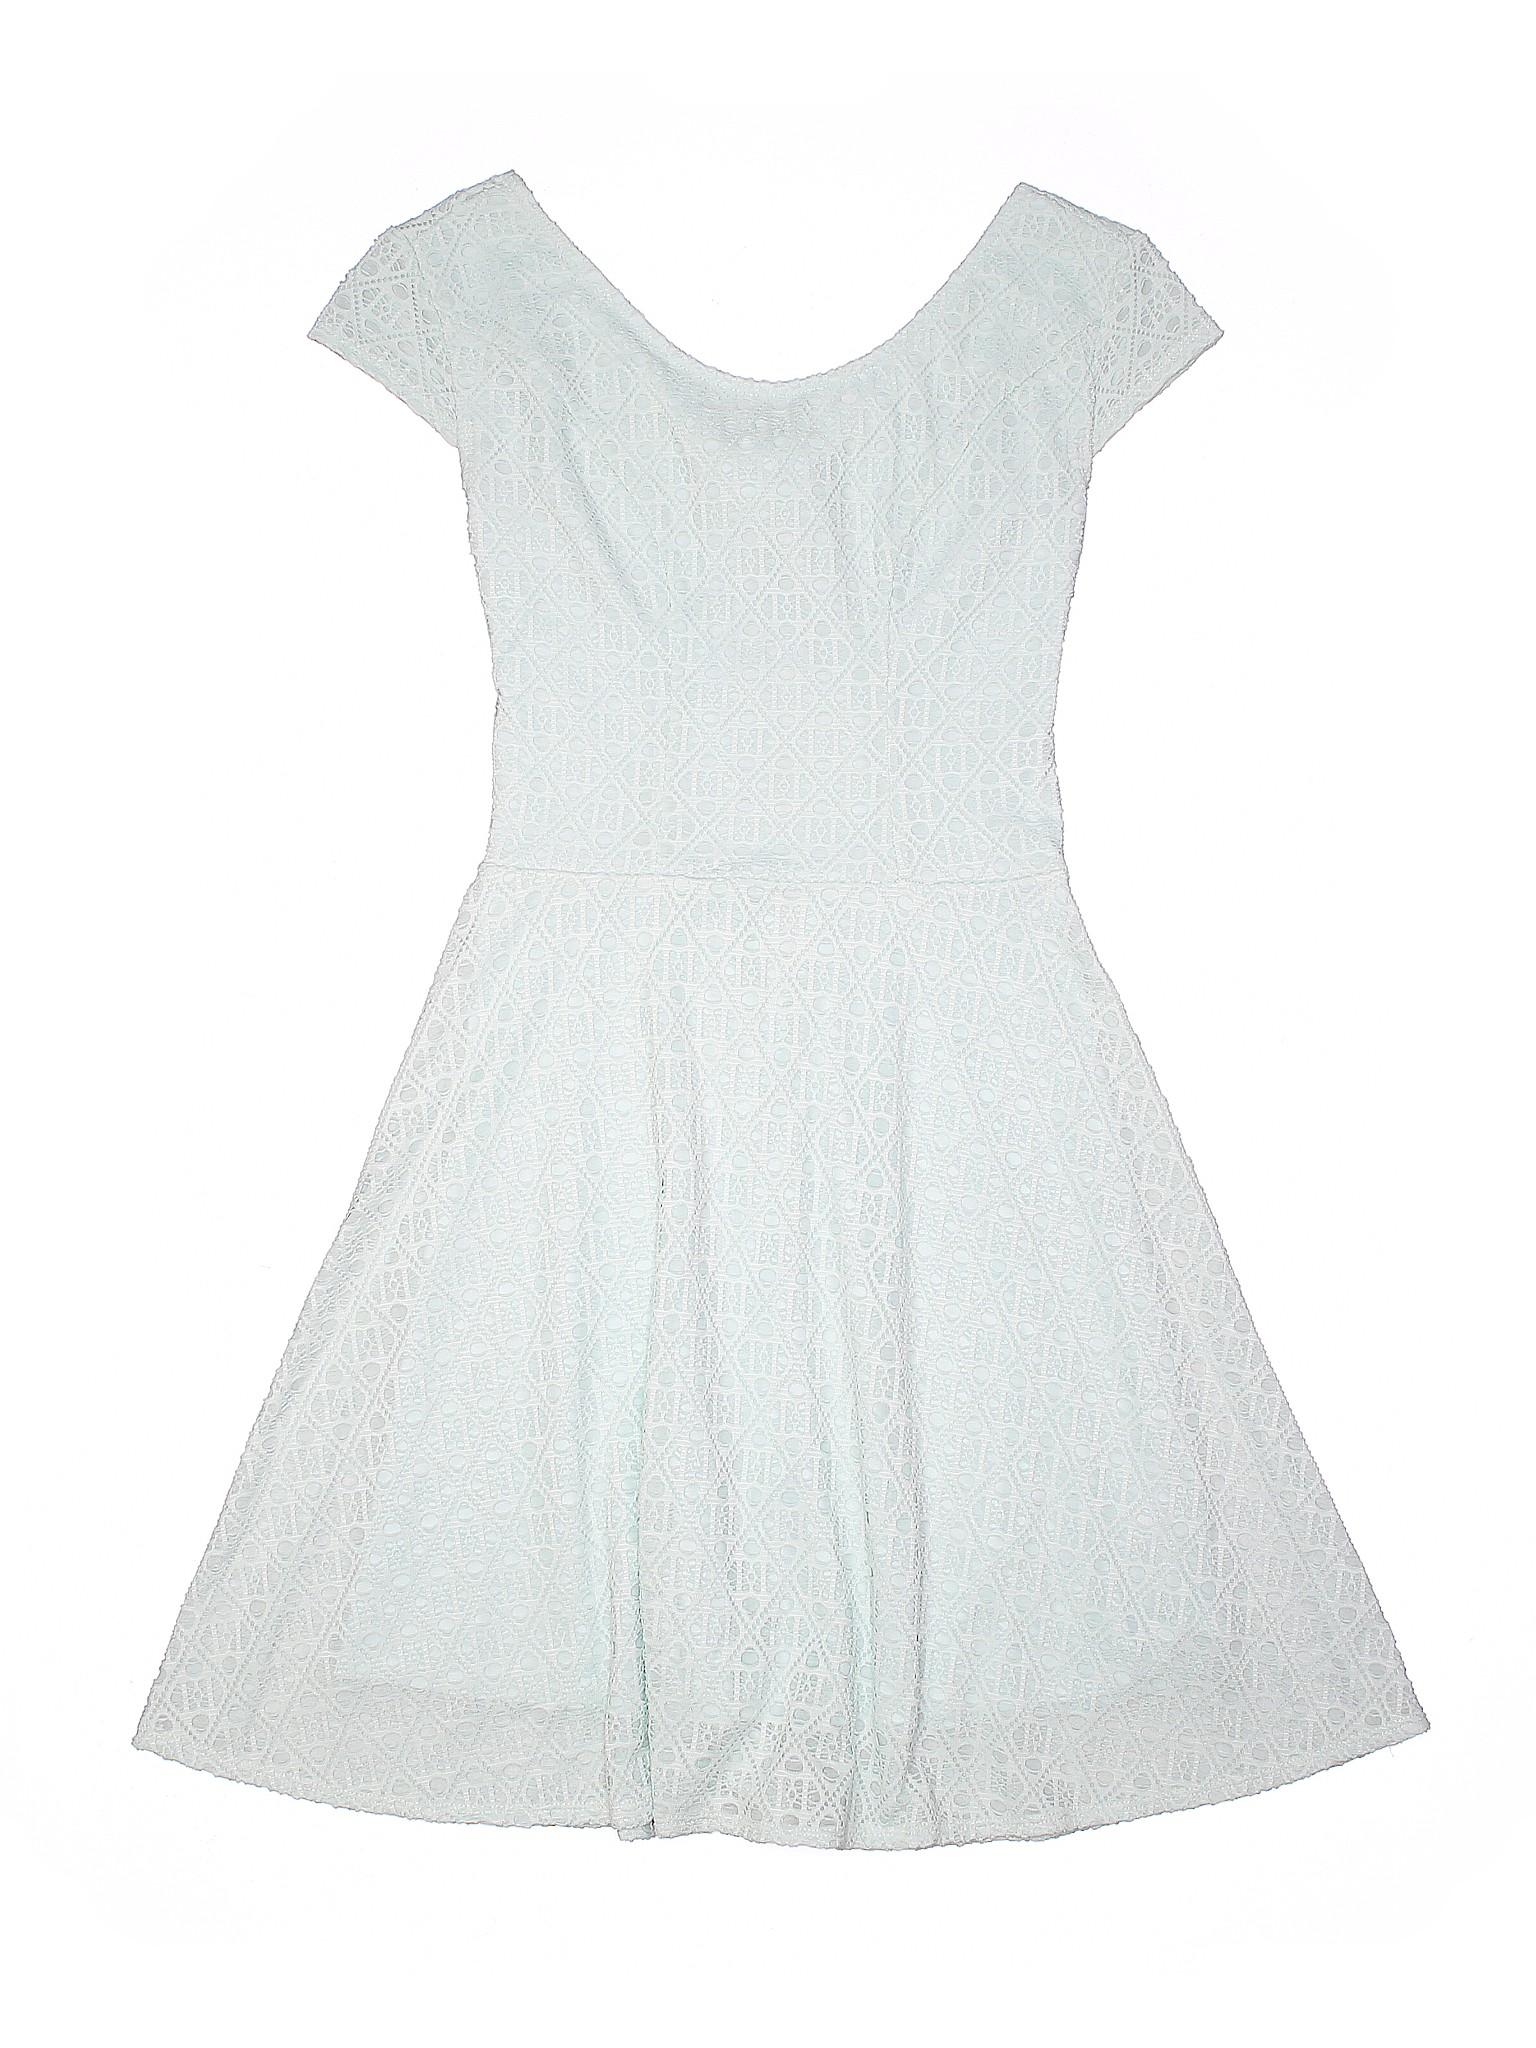 Dress Xhilaration winter Boutique winter Casual Boutique Xhilaration Dress winter Casual Boutique 4q61pIvW